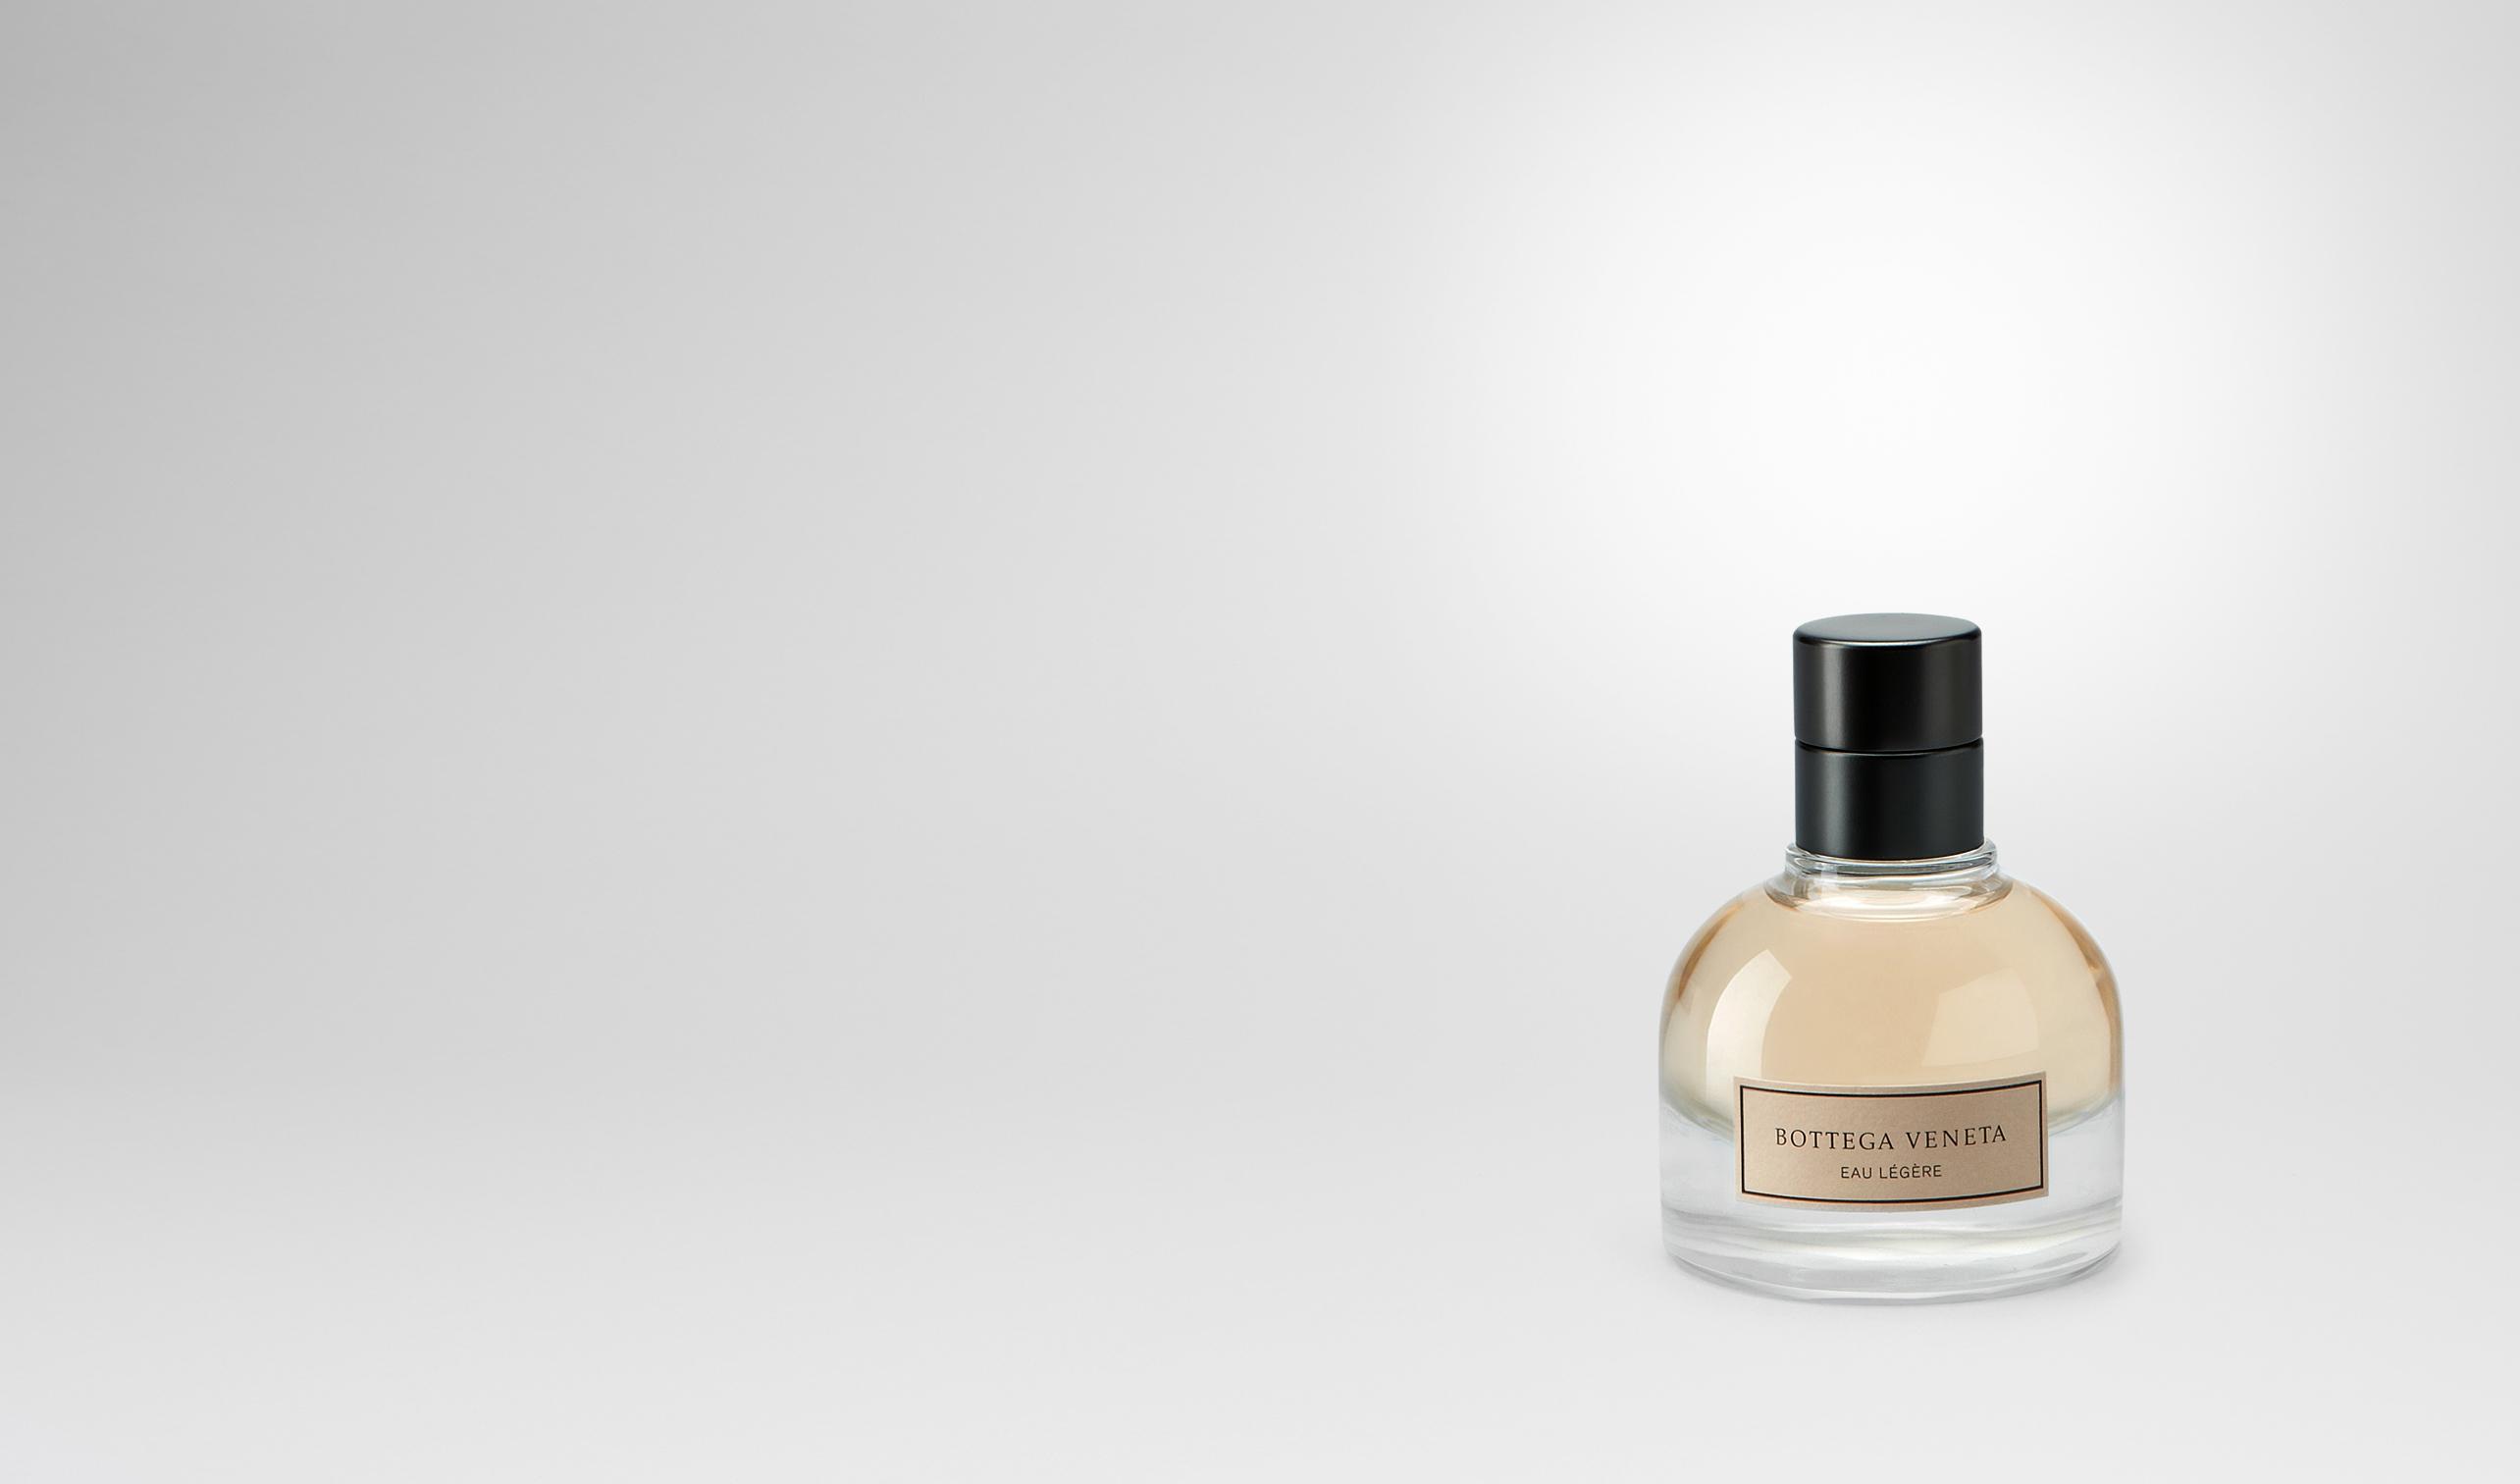 BOTTEGA VENETA Parfum D Bottega Veneta EAU LÉGÈRE 30 ml pl